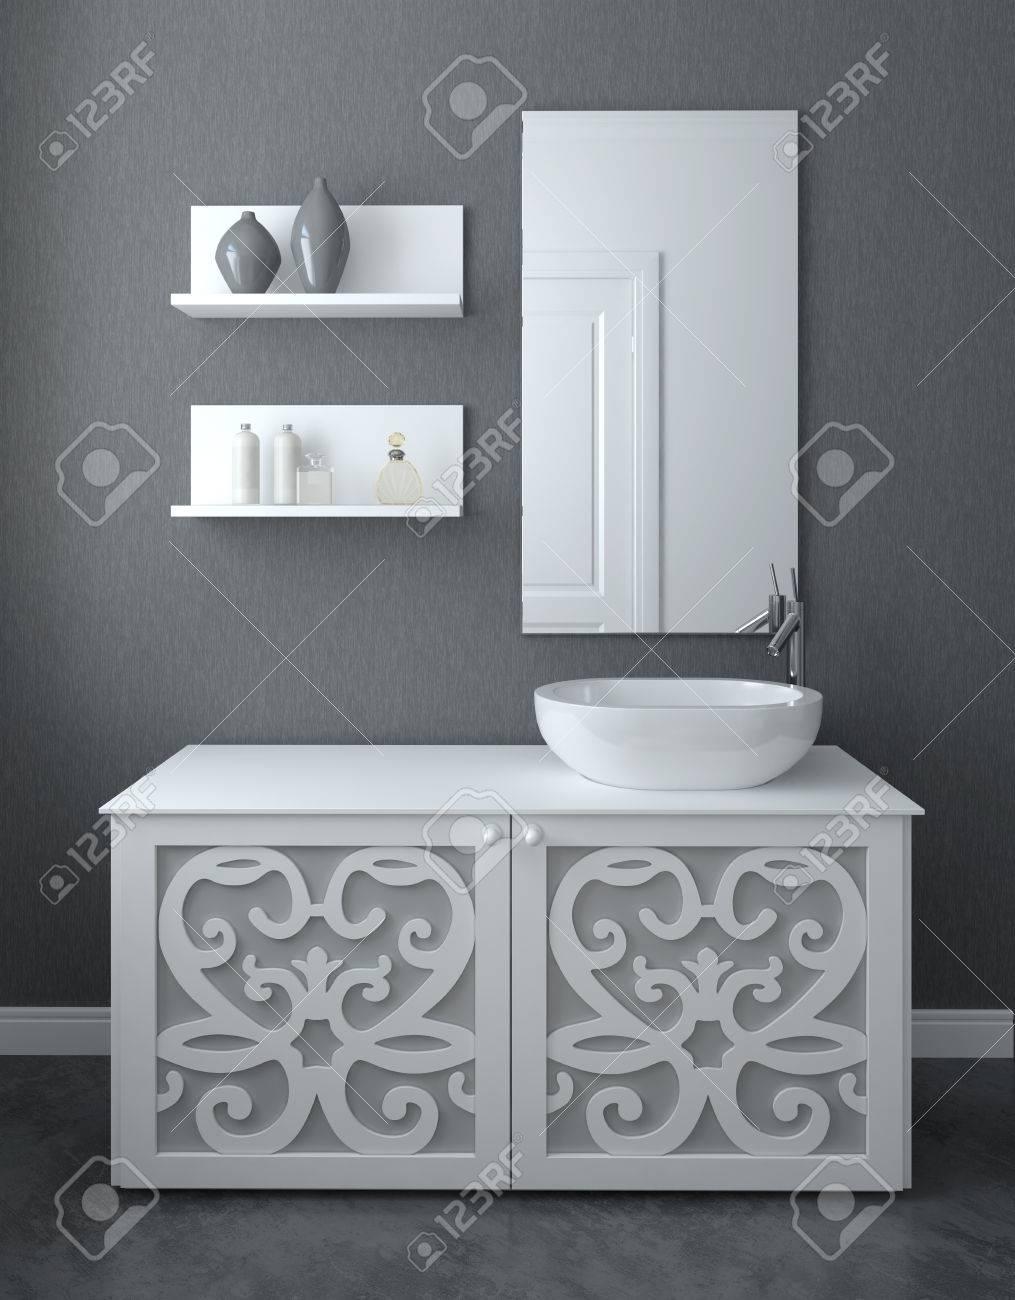 Modern bathroom interior. 3d render. - 45647840